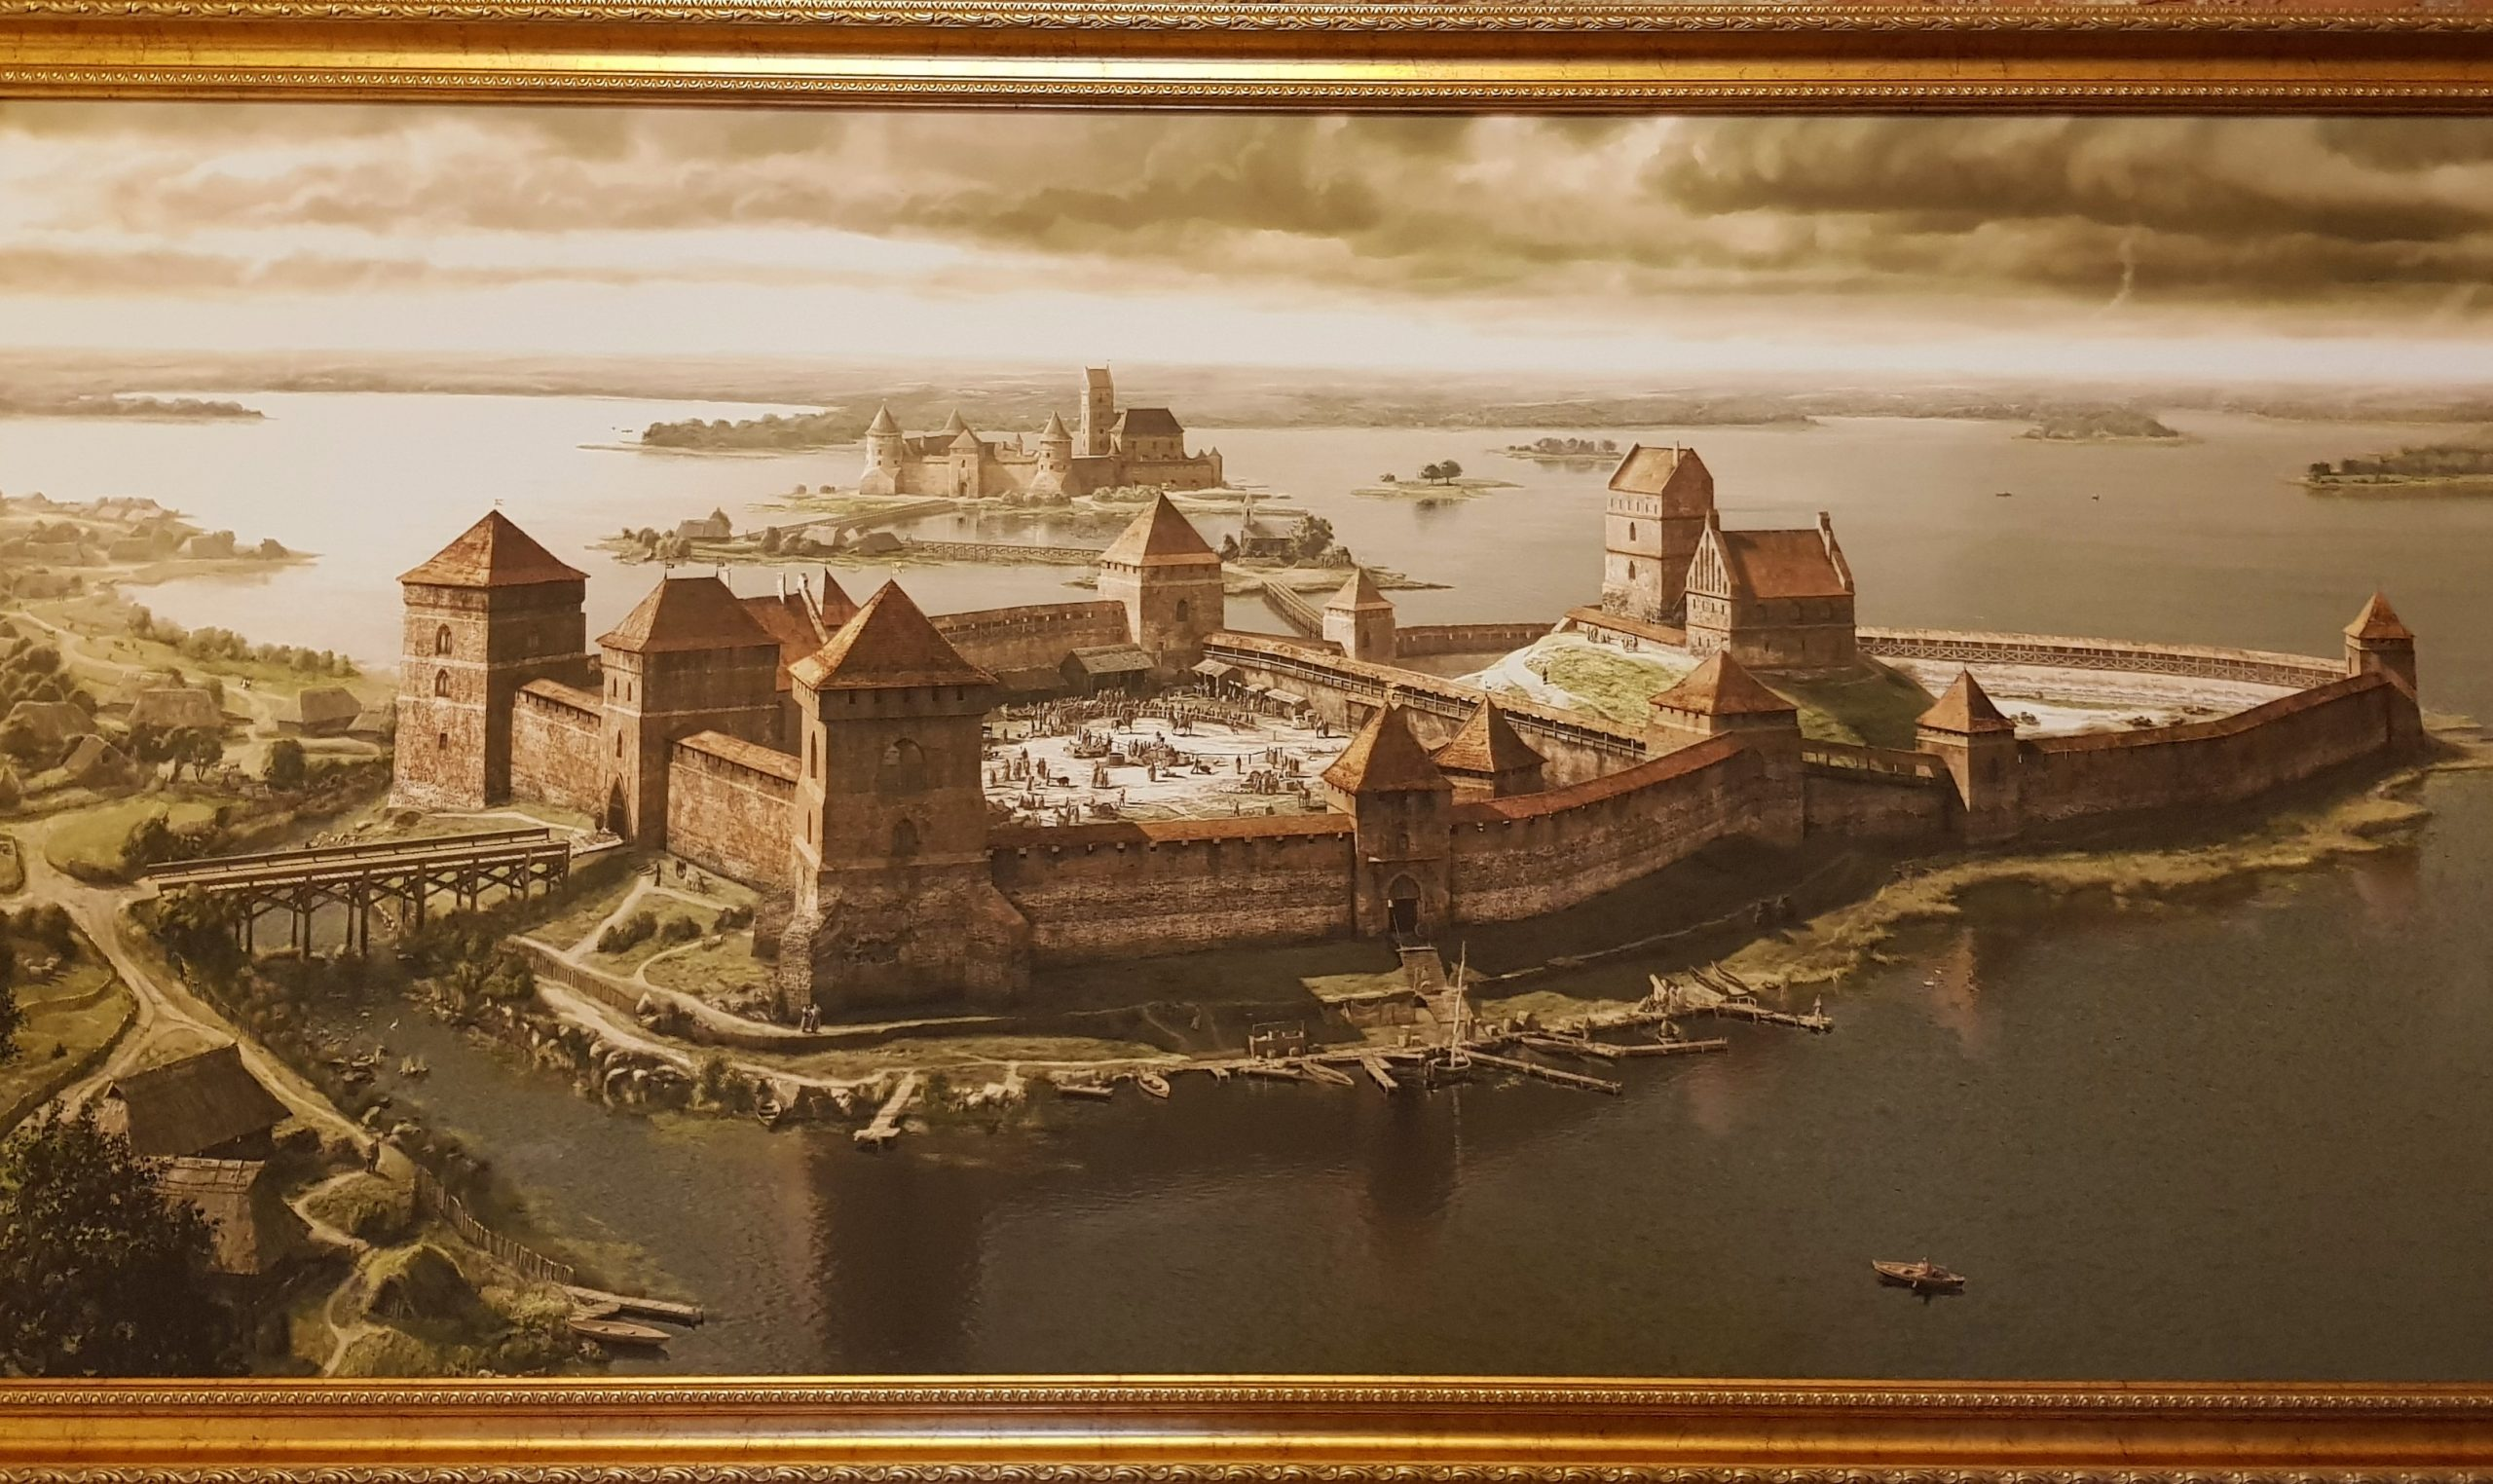 Cuadro de recreación de la fortaleza de Trakai